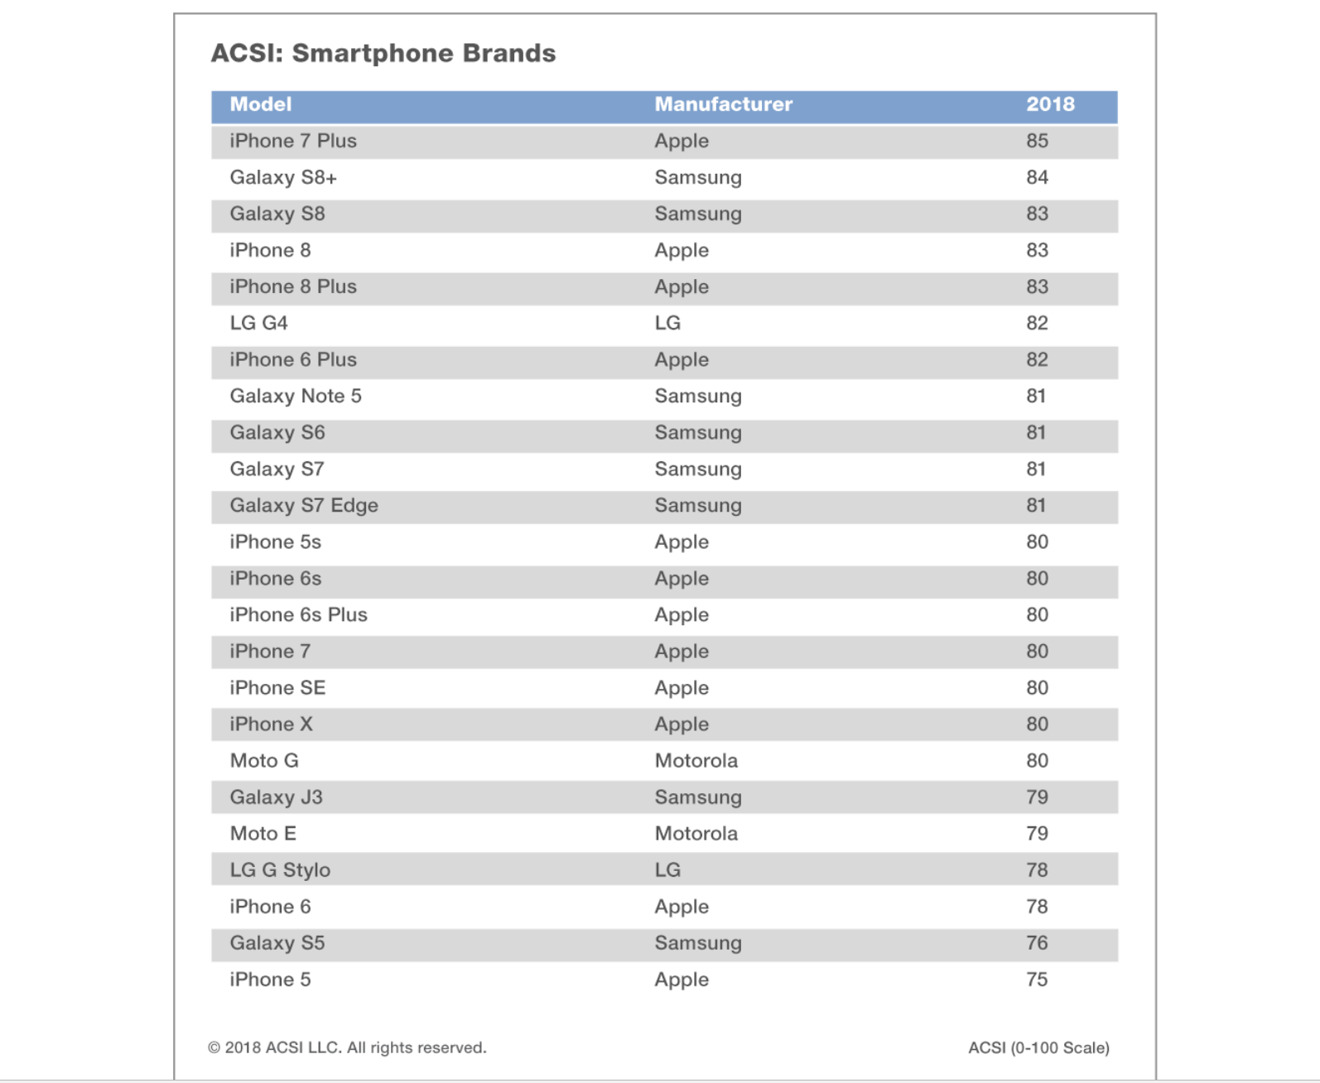 ASCI's 2018 smartphone rankings